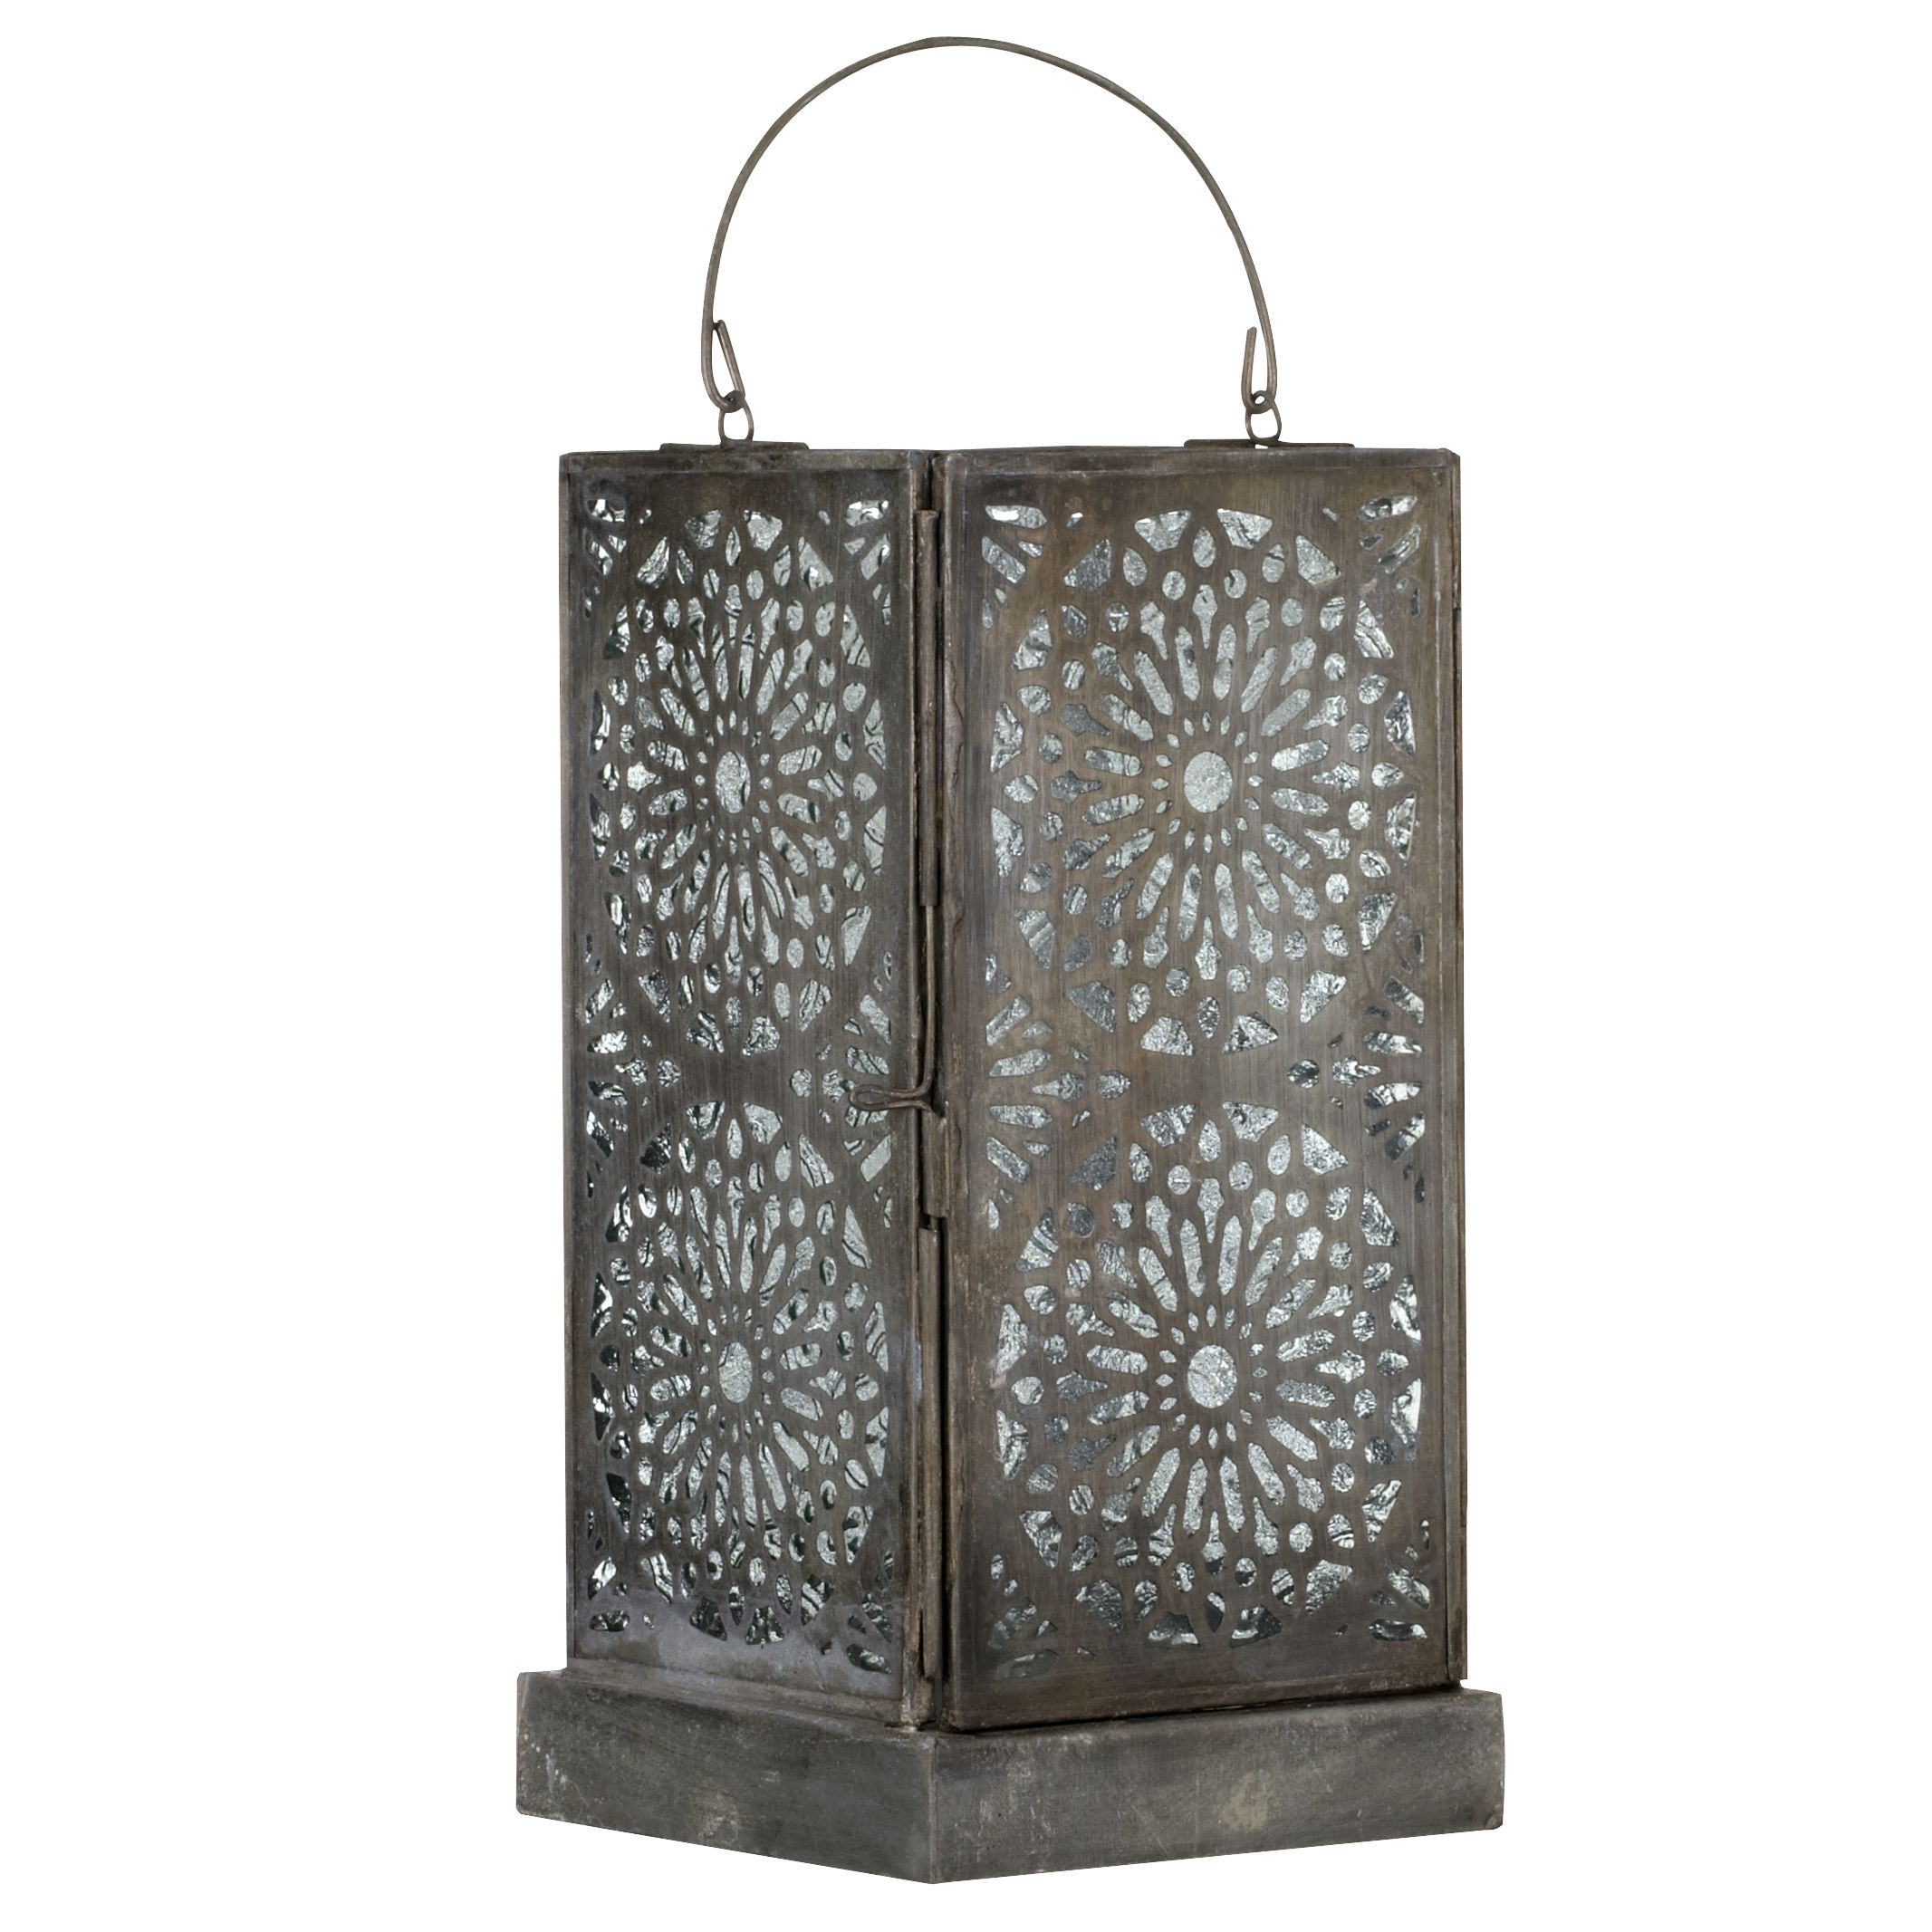 John Lewis Antique Lantern, Medium